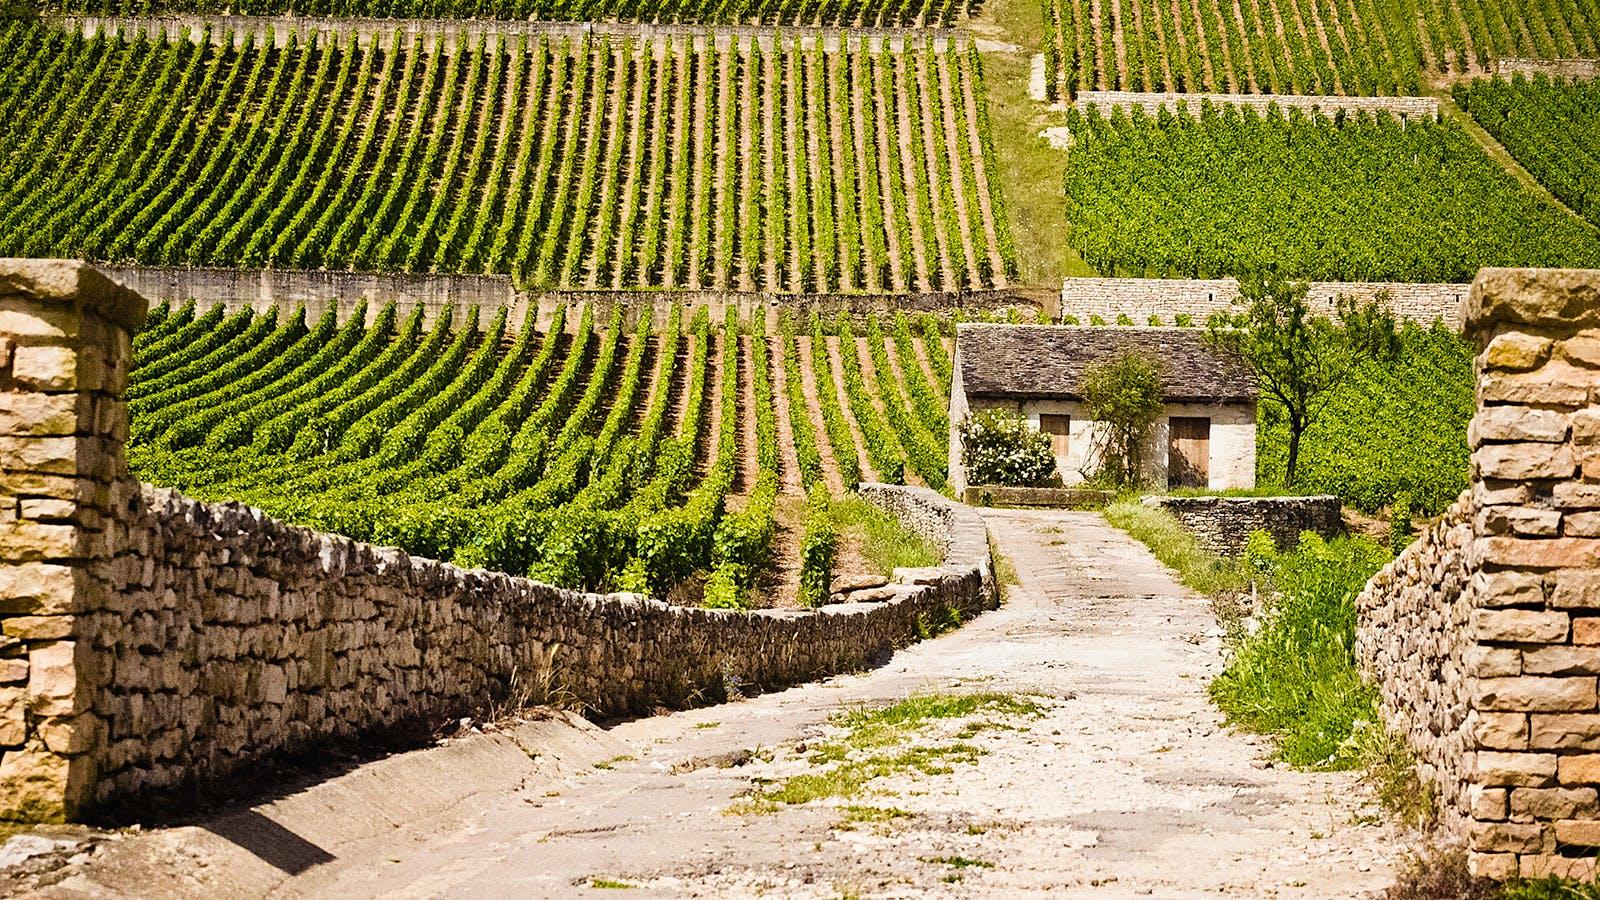 8 Satisfying Burgundy Values